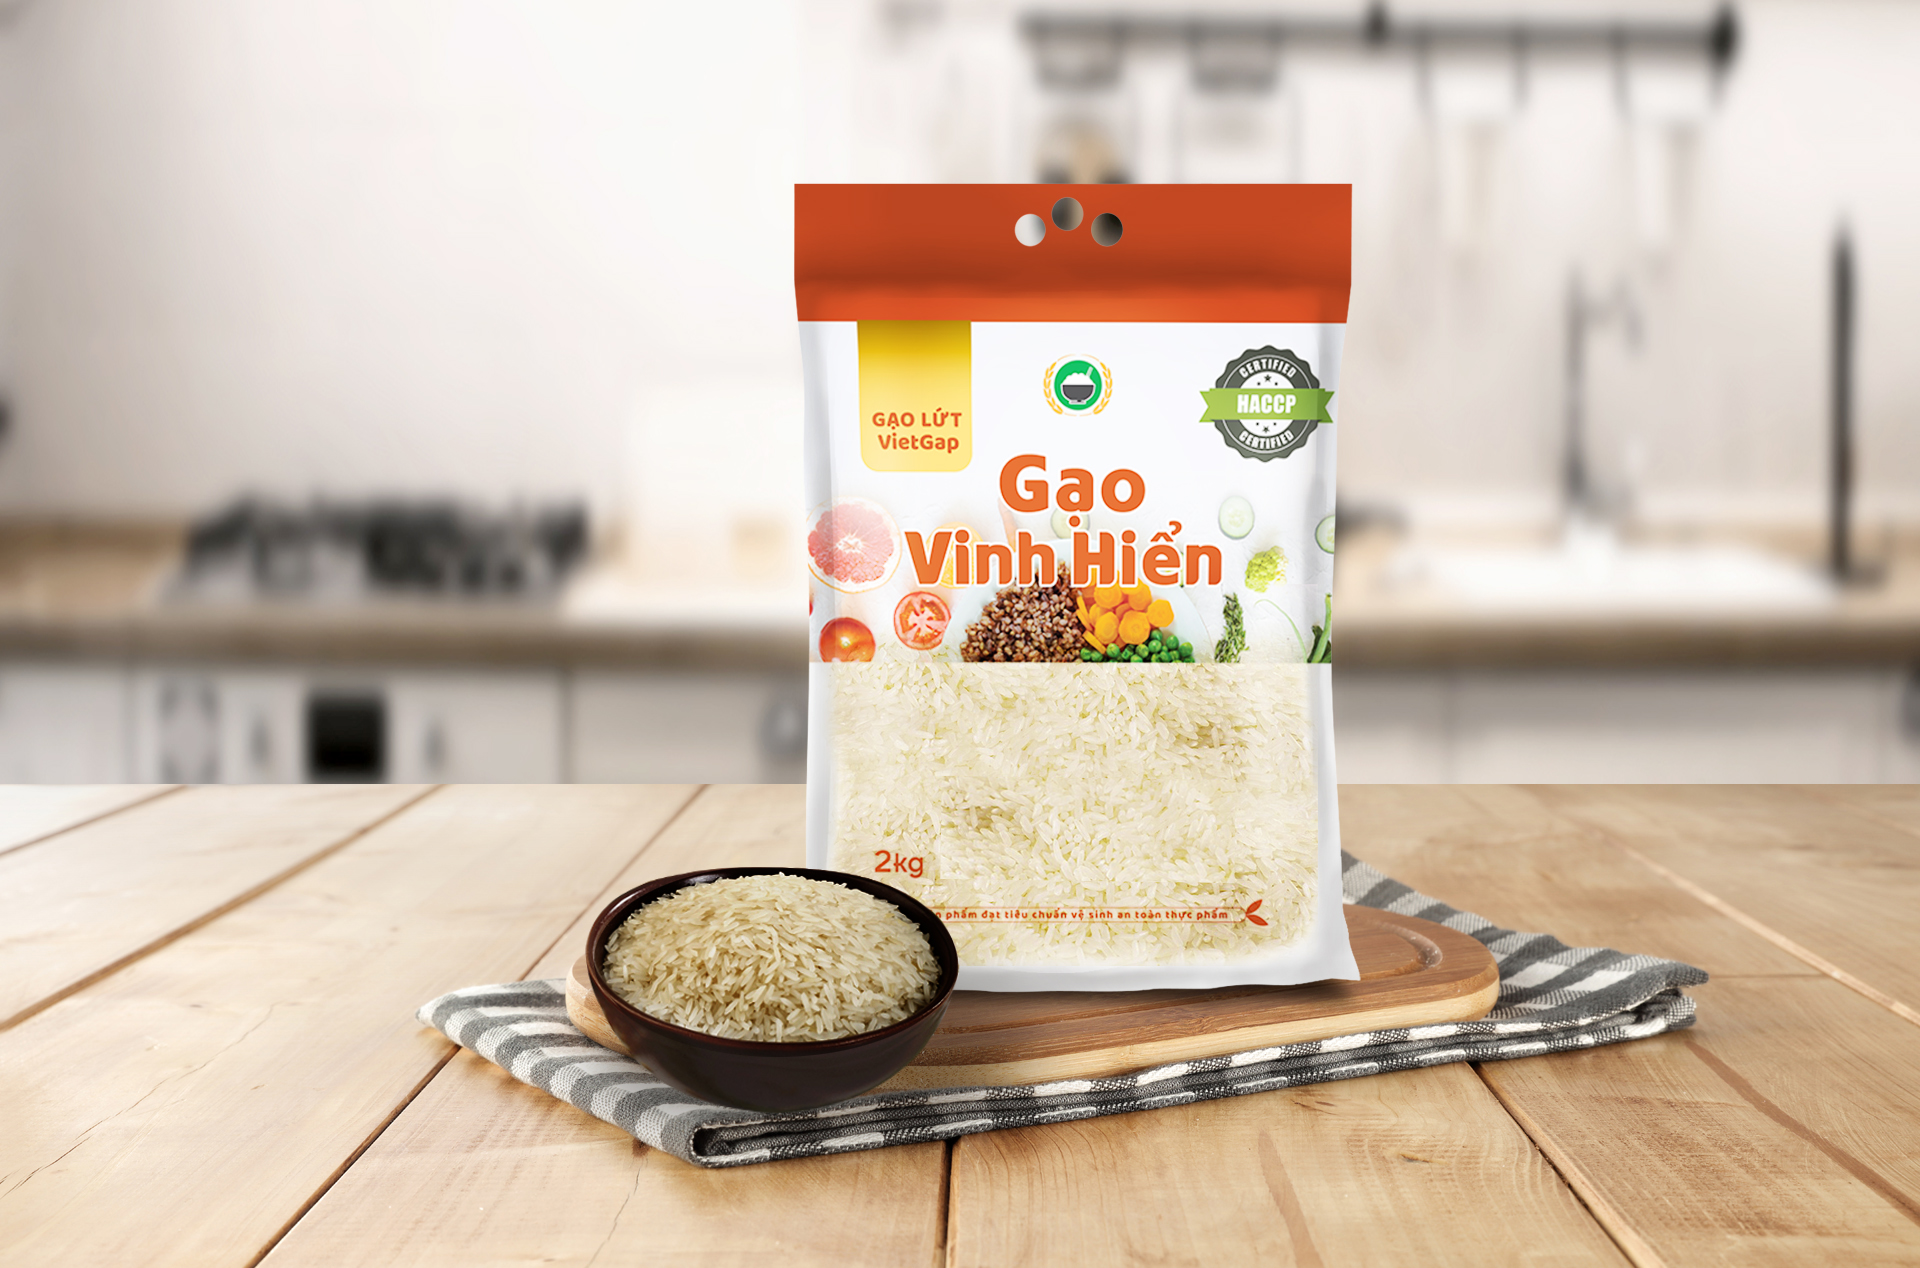 sản xuất gạo lứt VietGAP